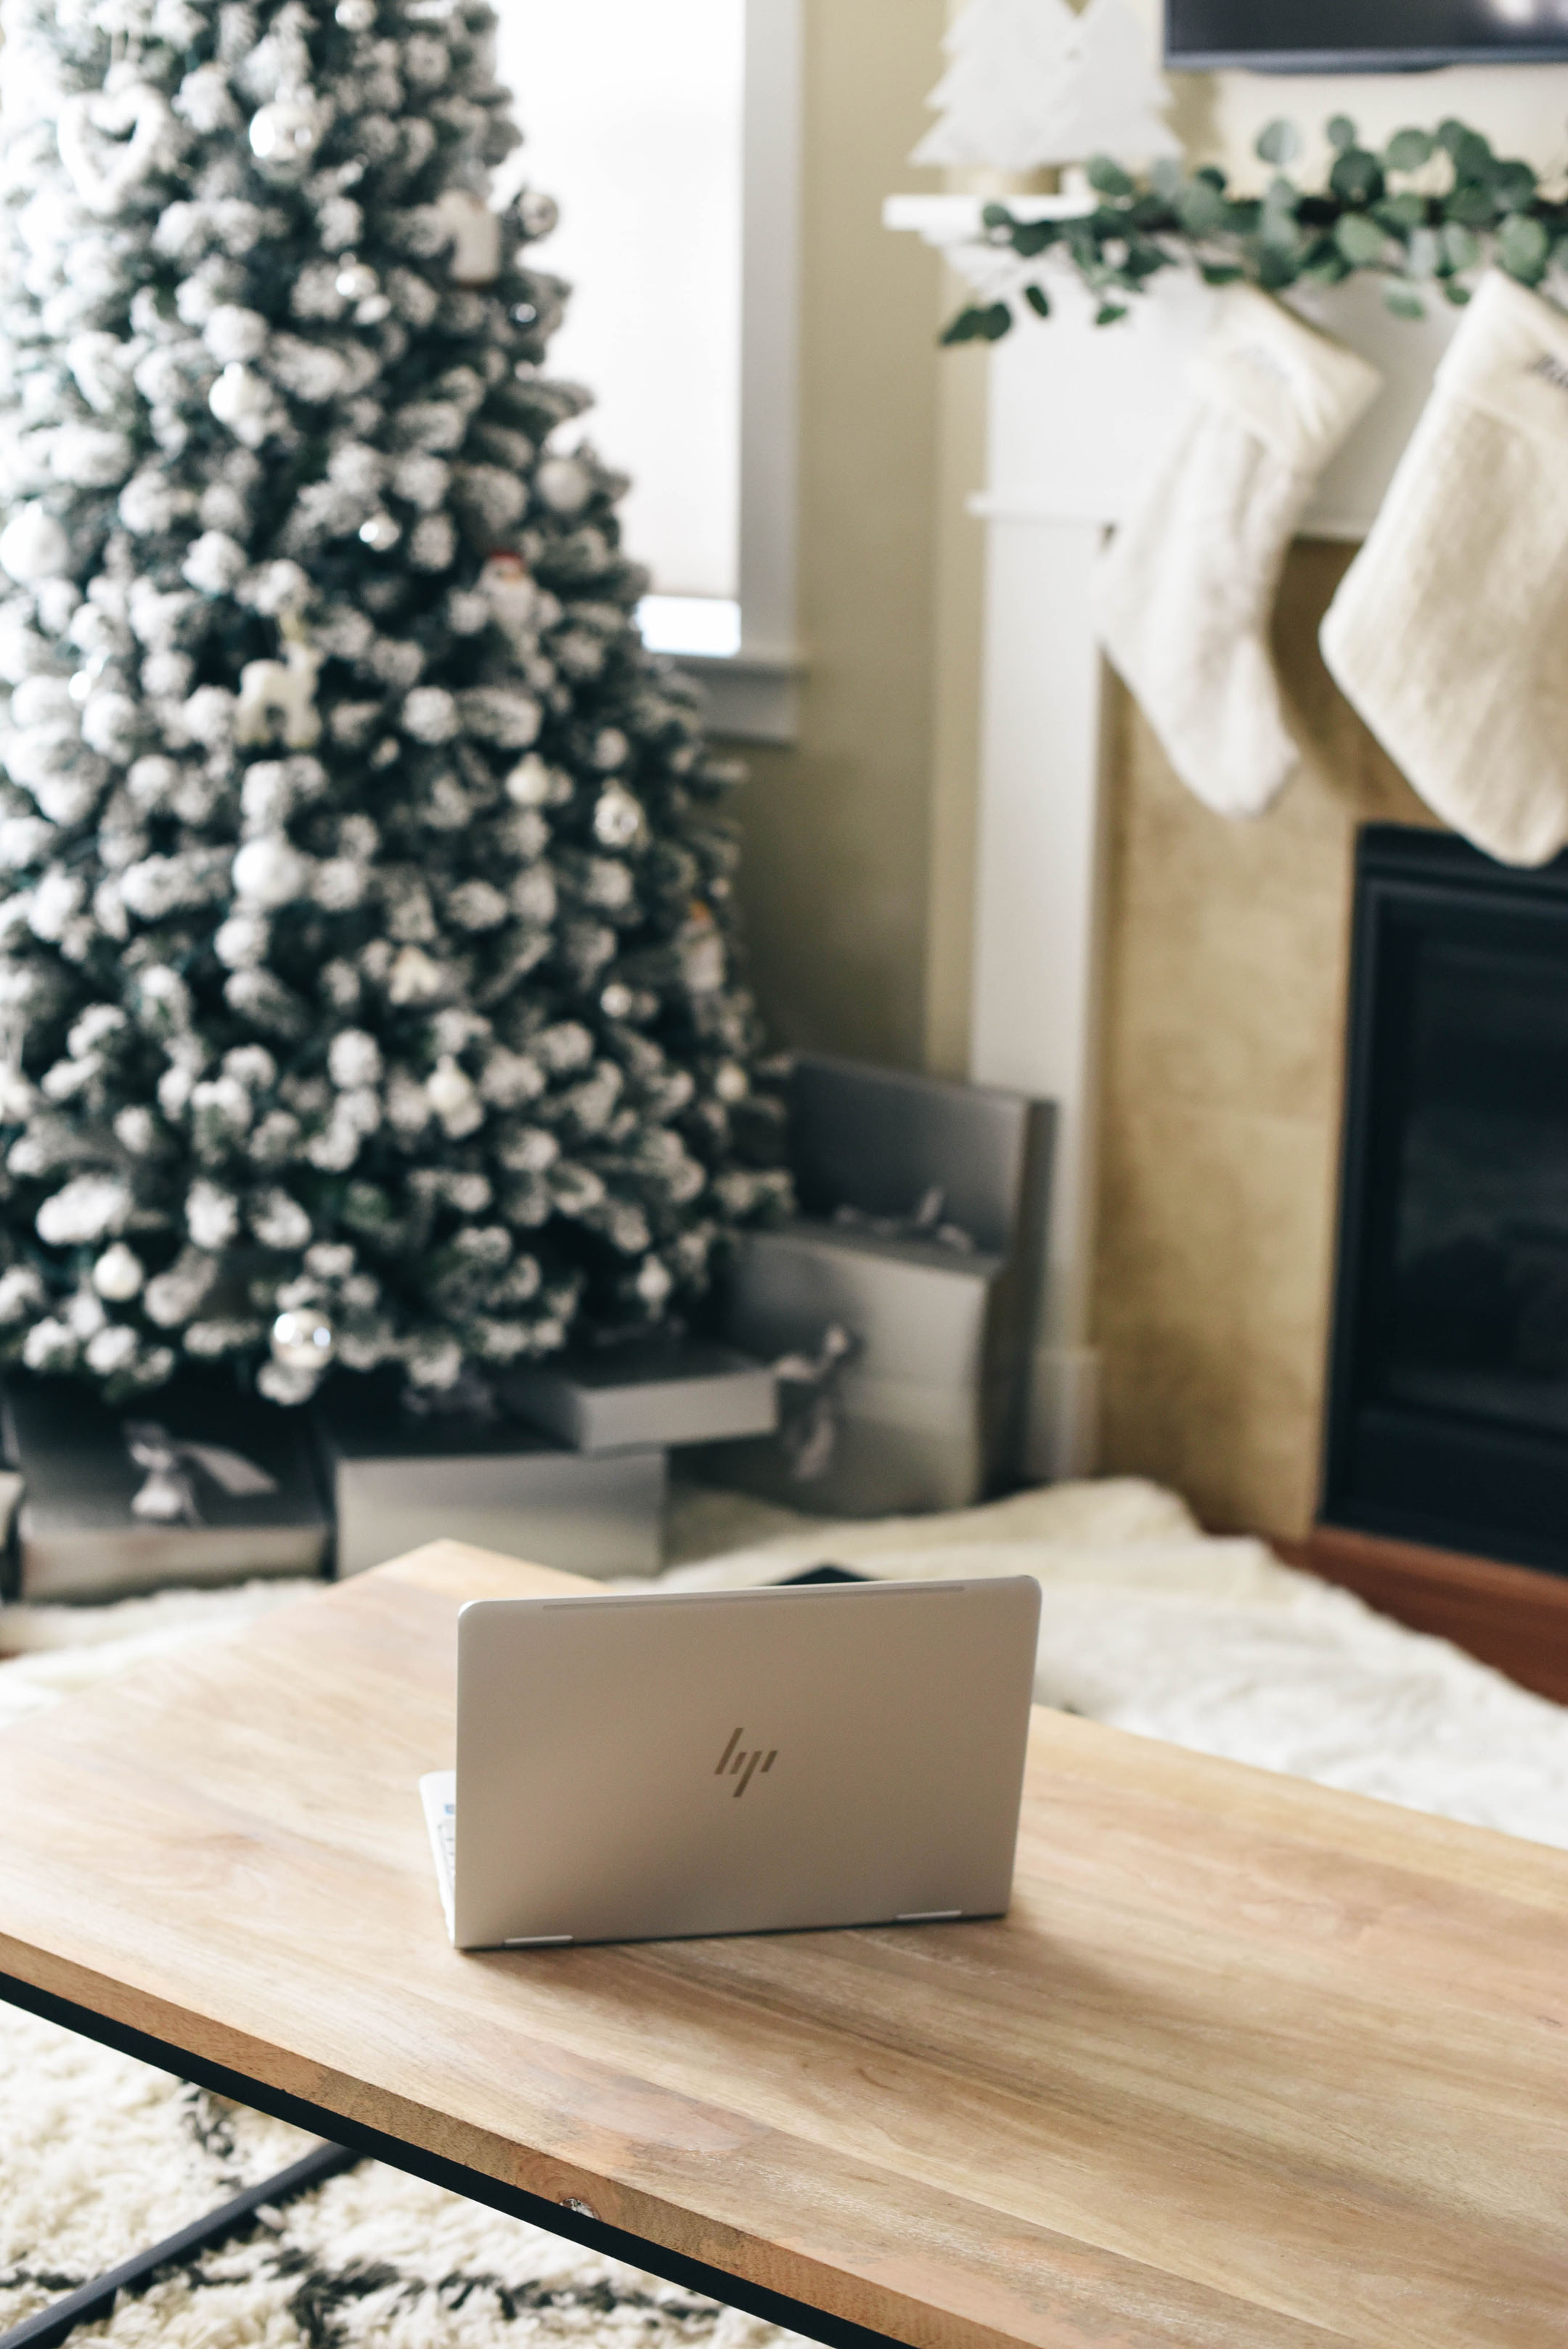 the-best-hp-laptop-spectre-x360